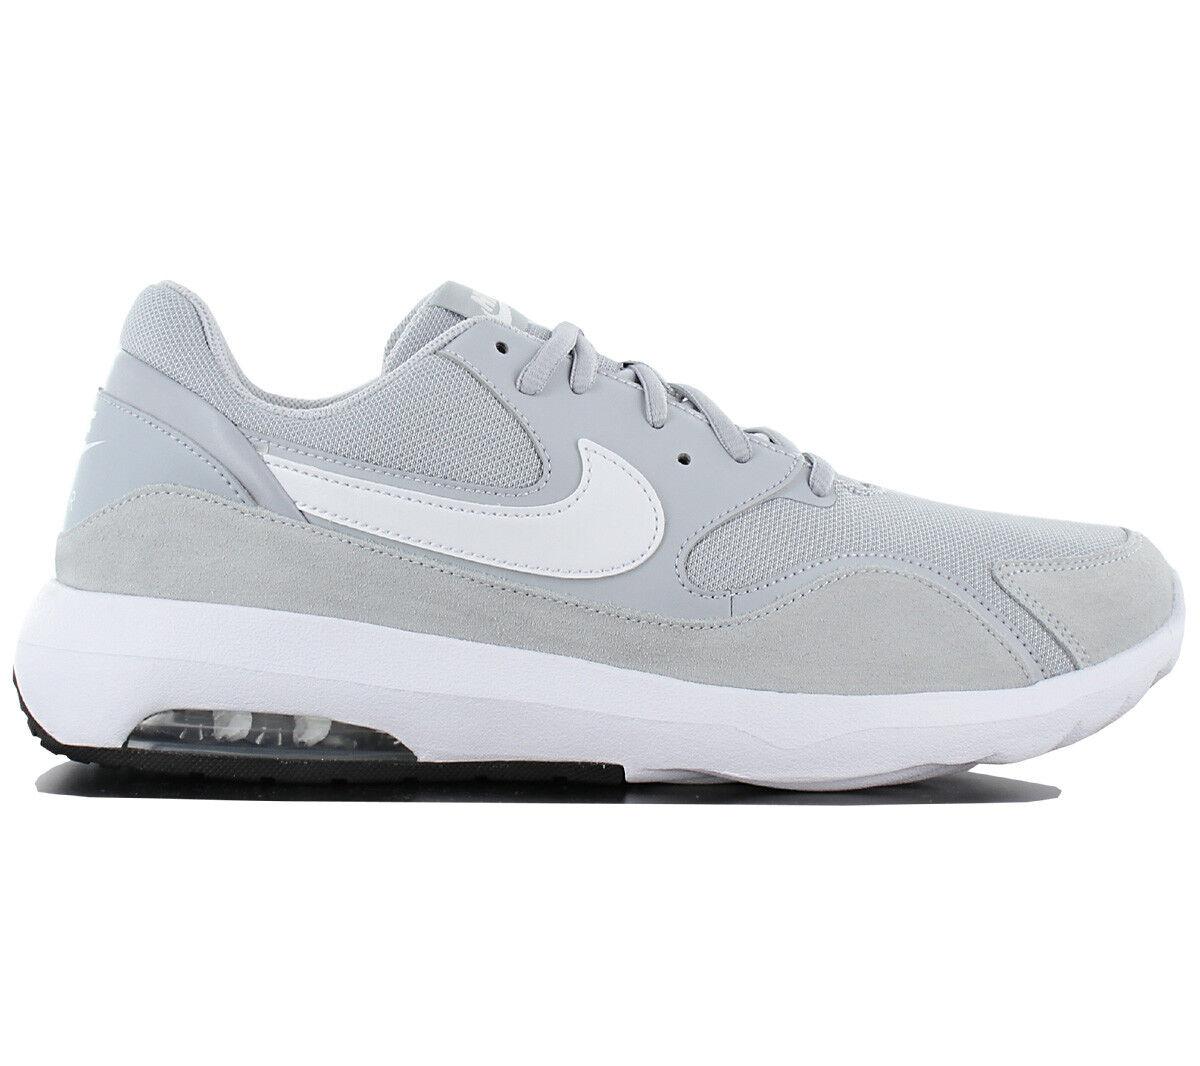 Nike Air Max Nostalgic Men's Sneakers shoes Grey Classic 916781-001